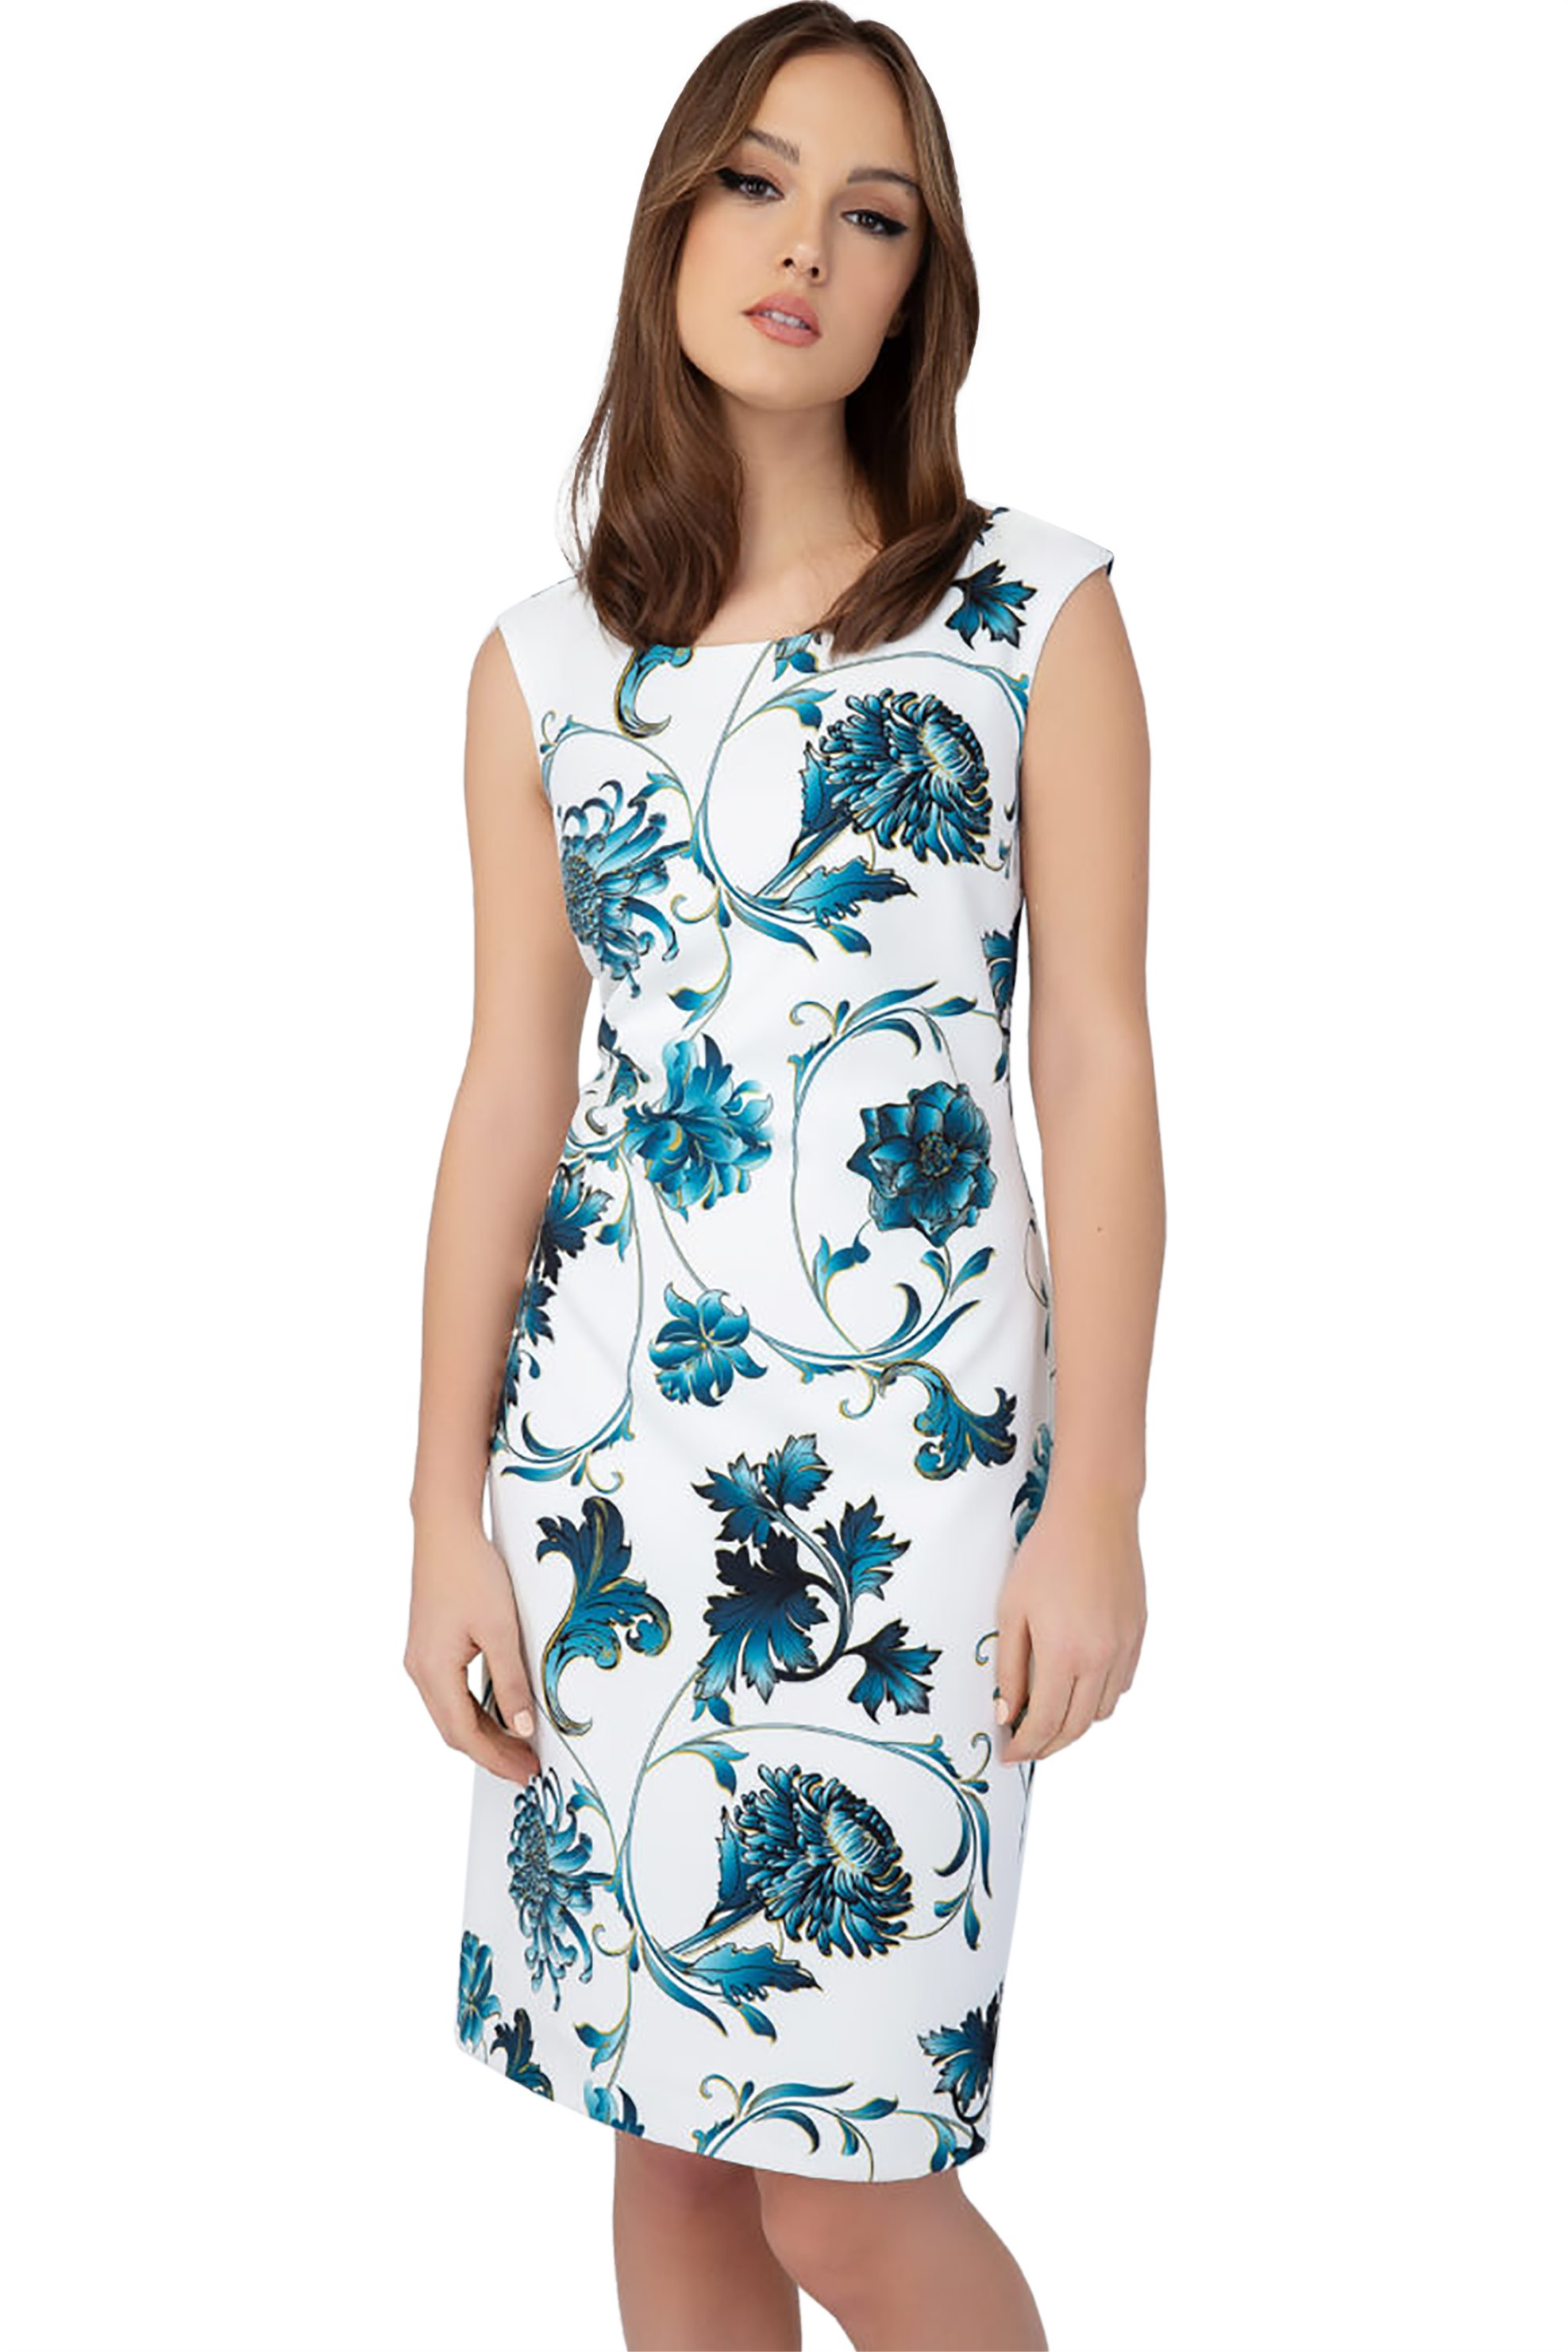 Billy Sabbado γυναικείο αμάνικο pencil φόρεμα με floral prin - 0208907166 - Λευκ γυναικα   ρουχα   φορέματα   mini φορέματα